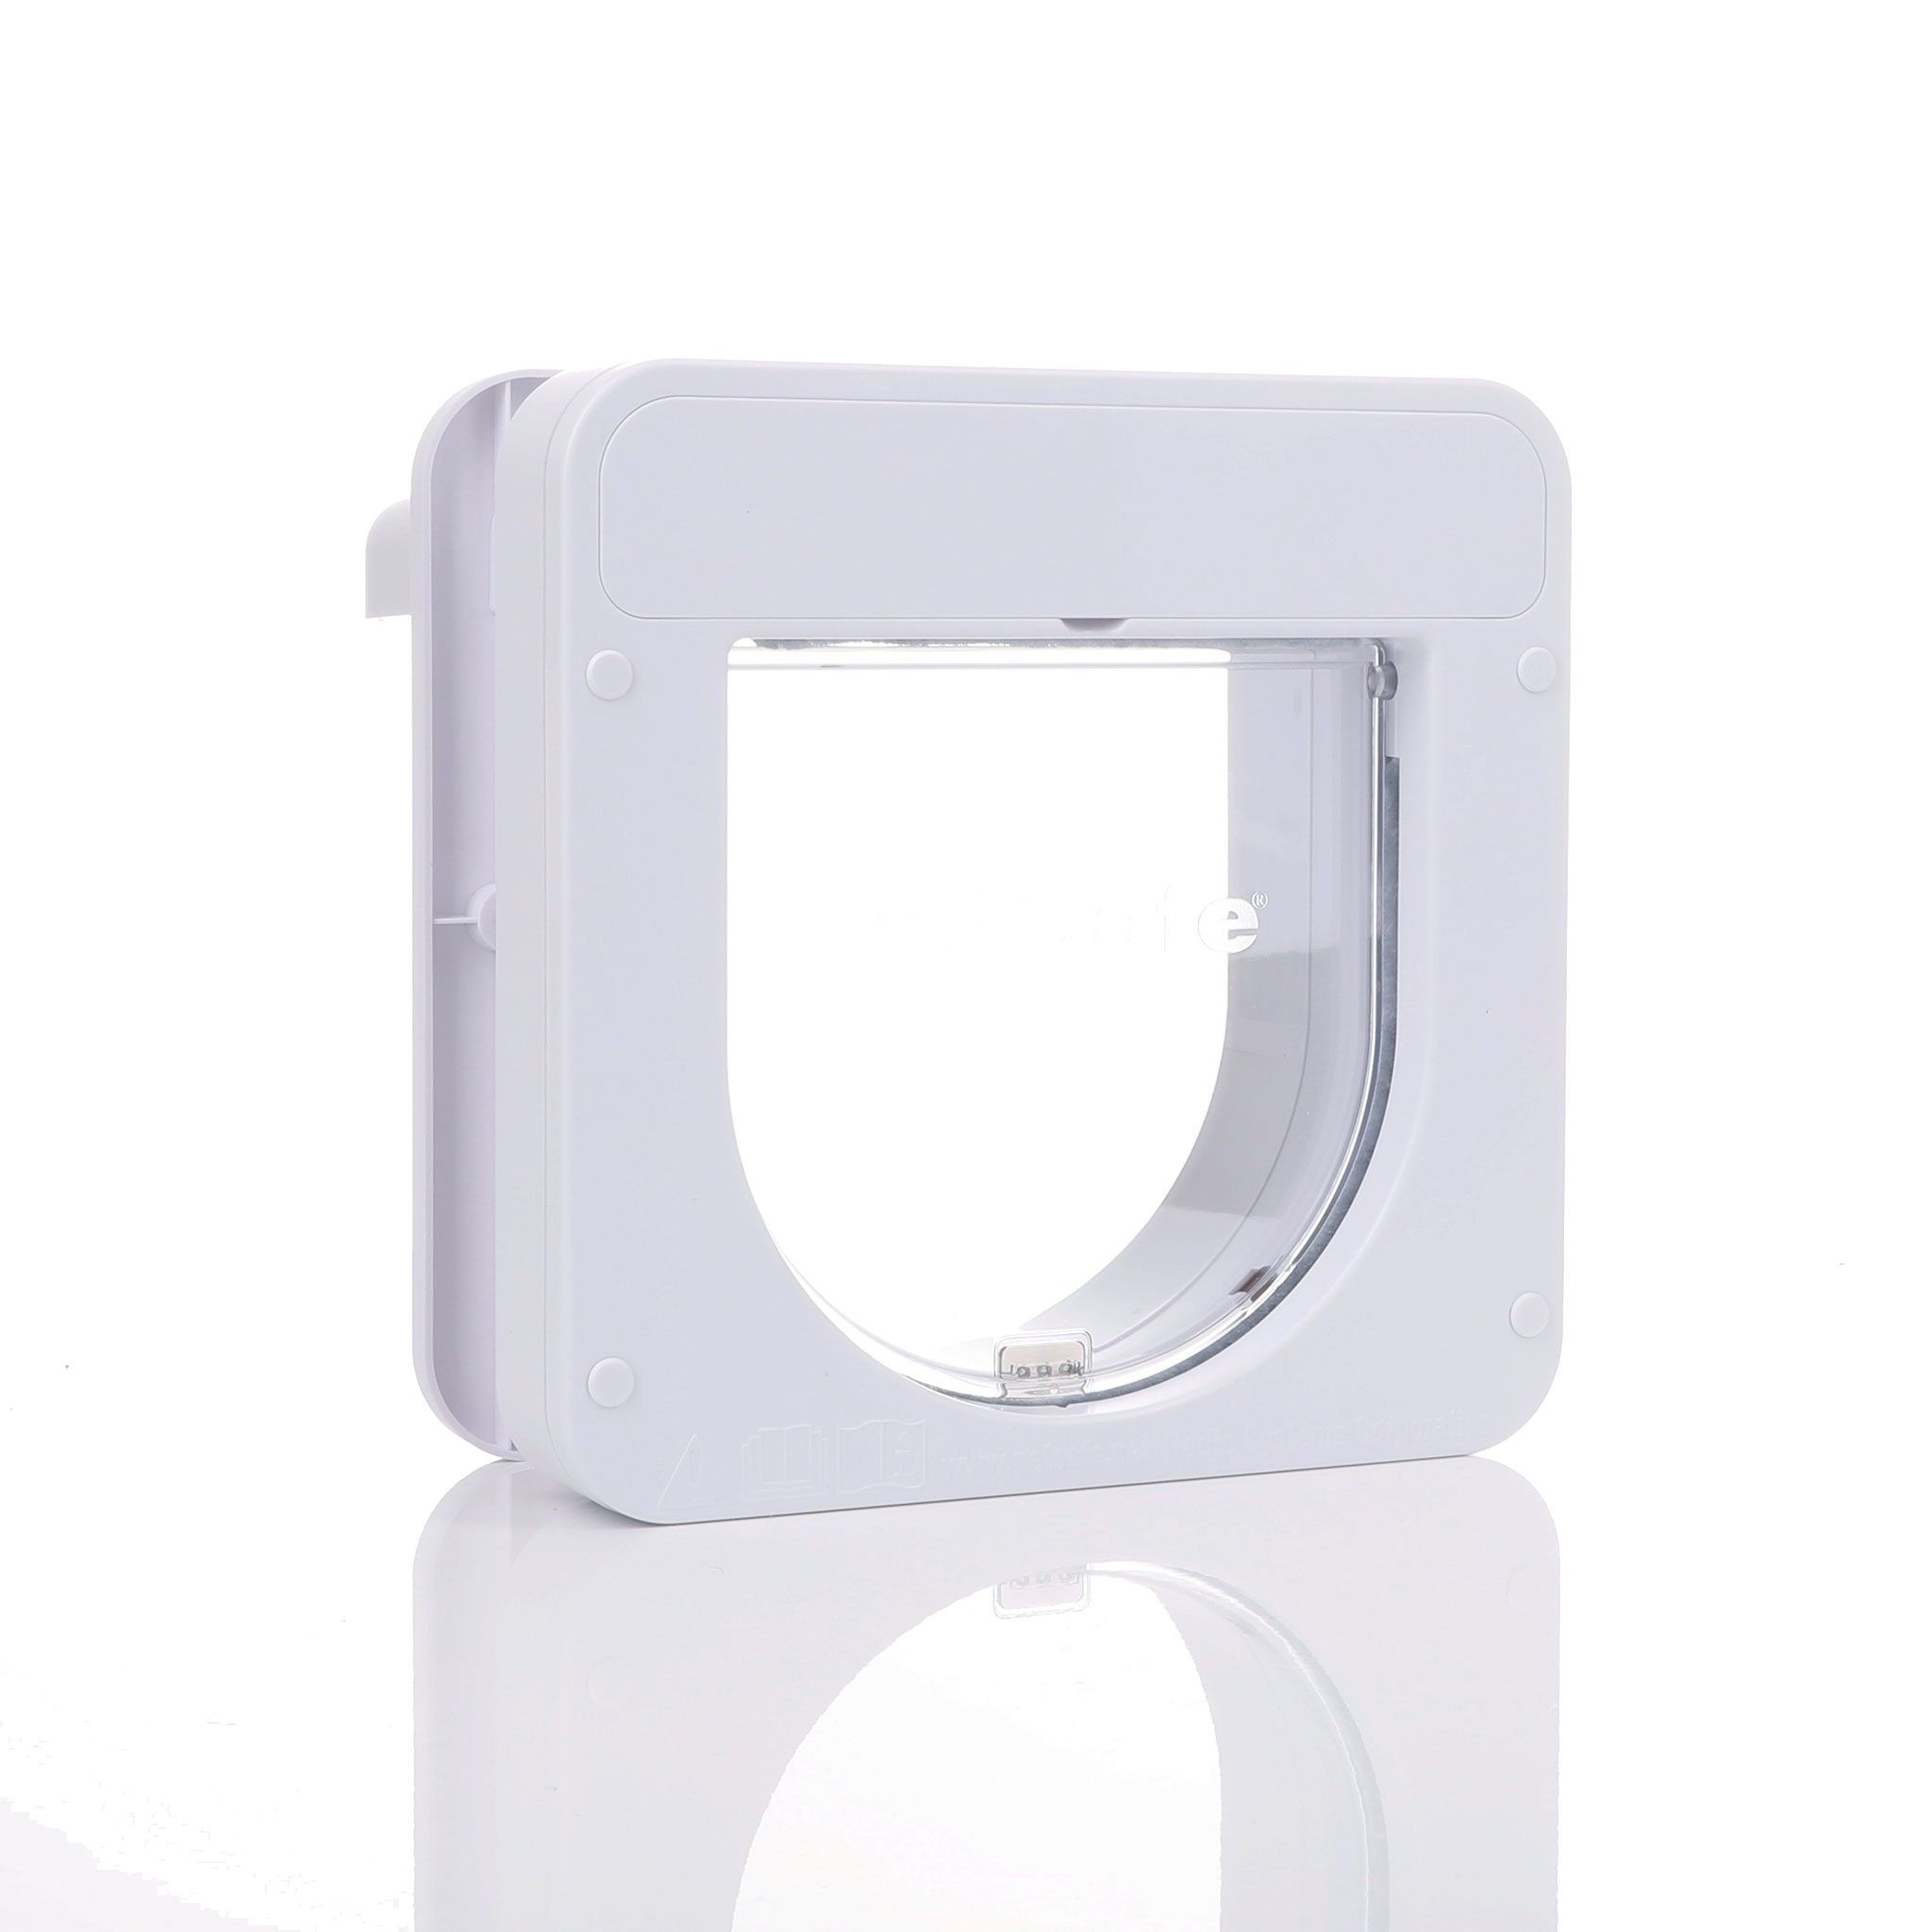 PetPorte Smart Cat Flap White Frame Clear Flap